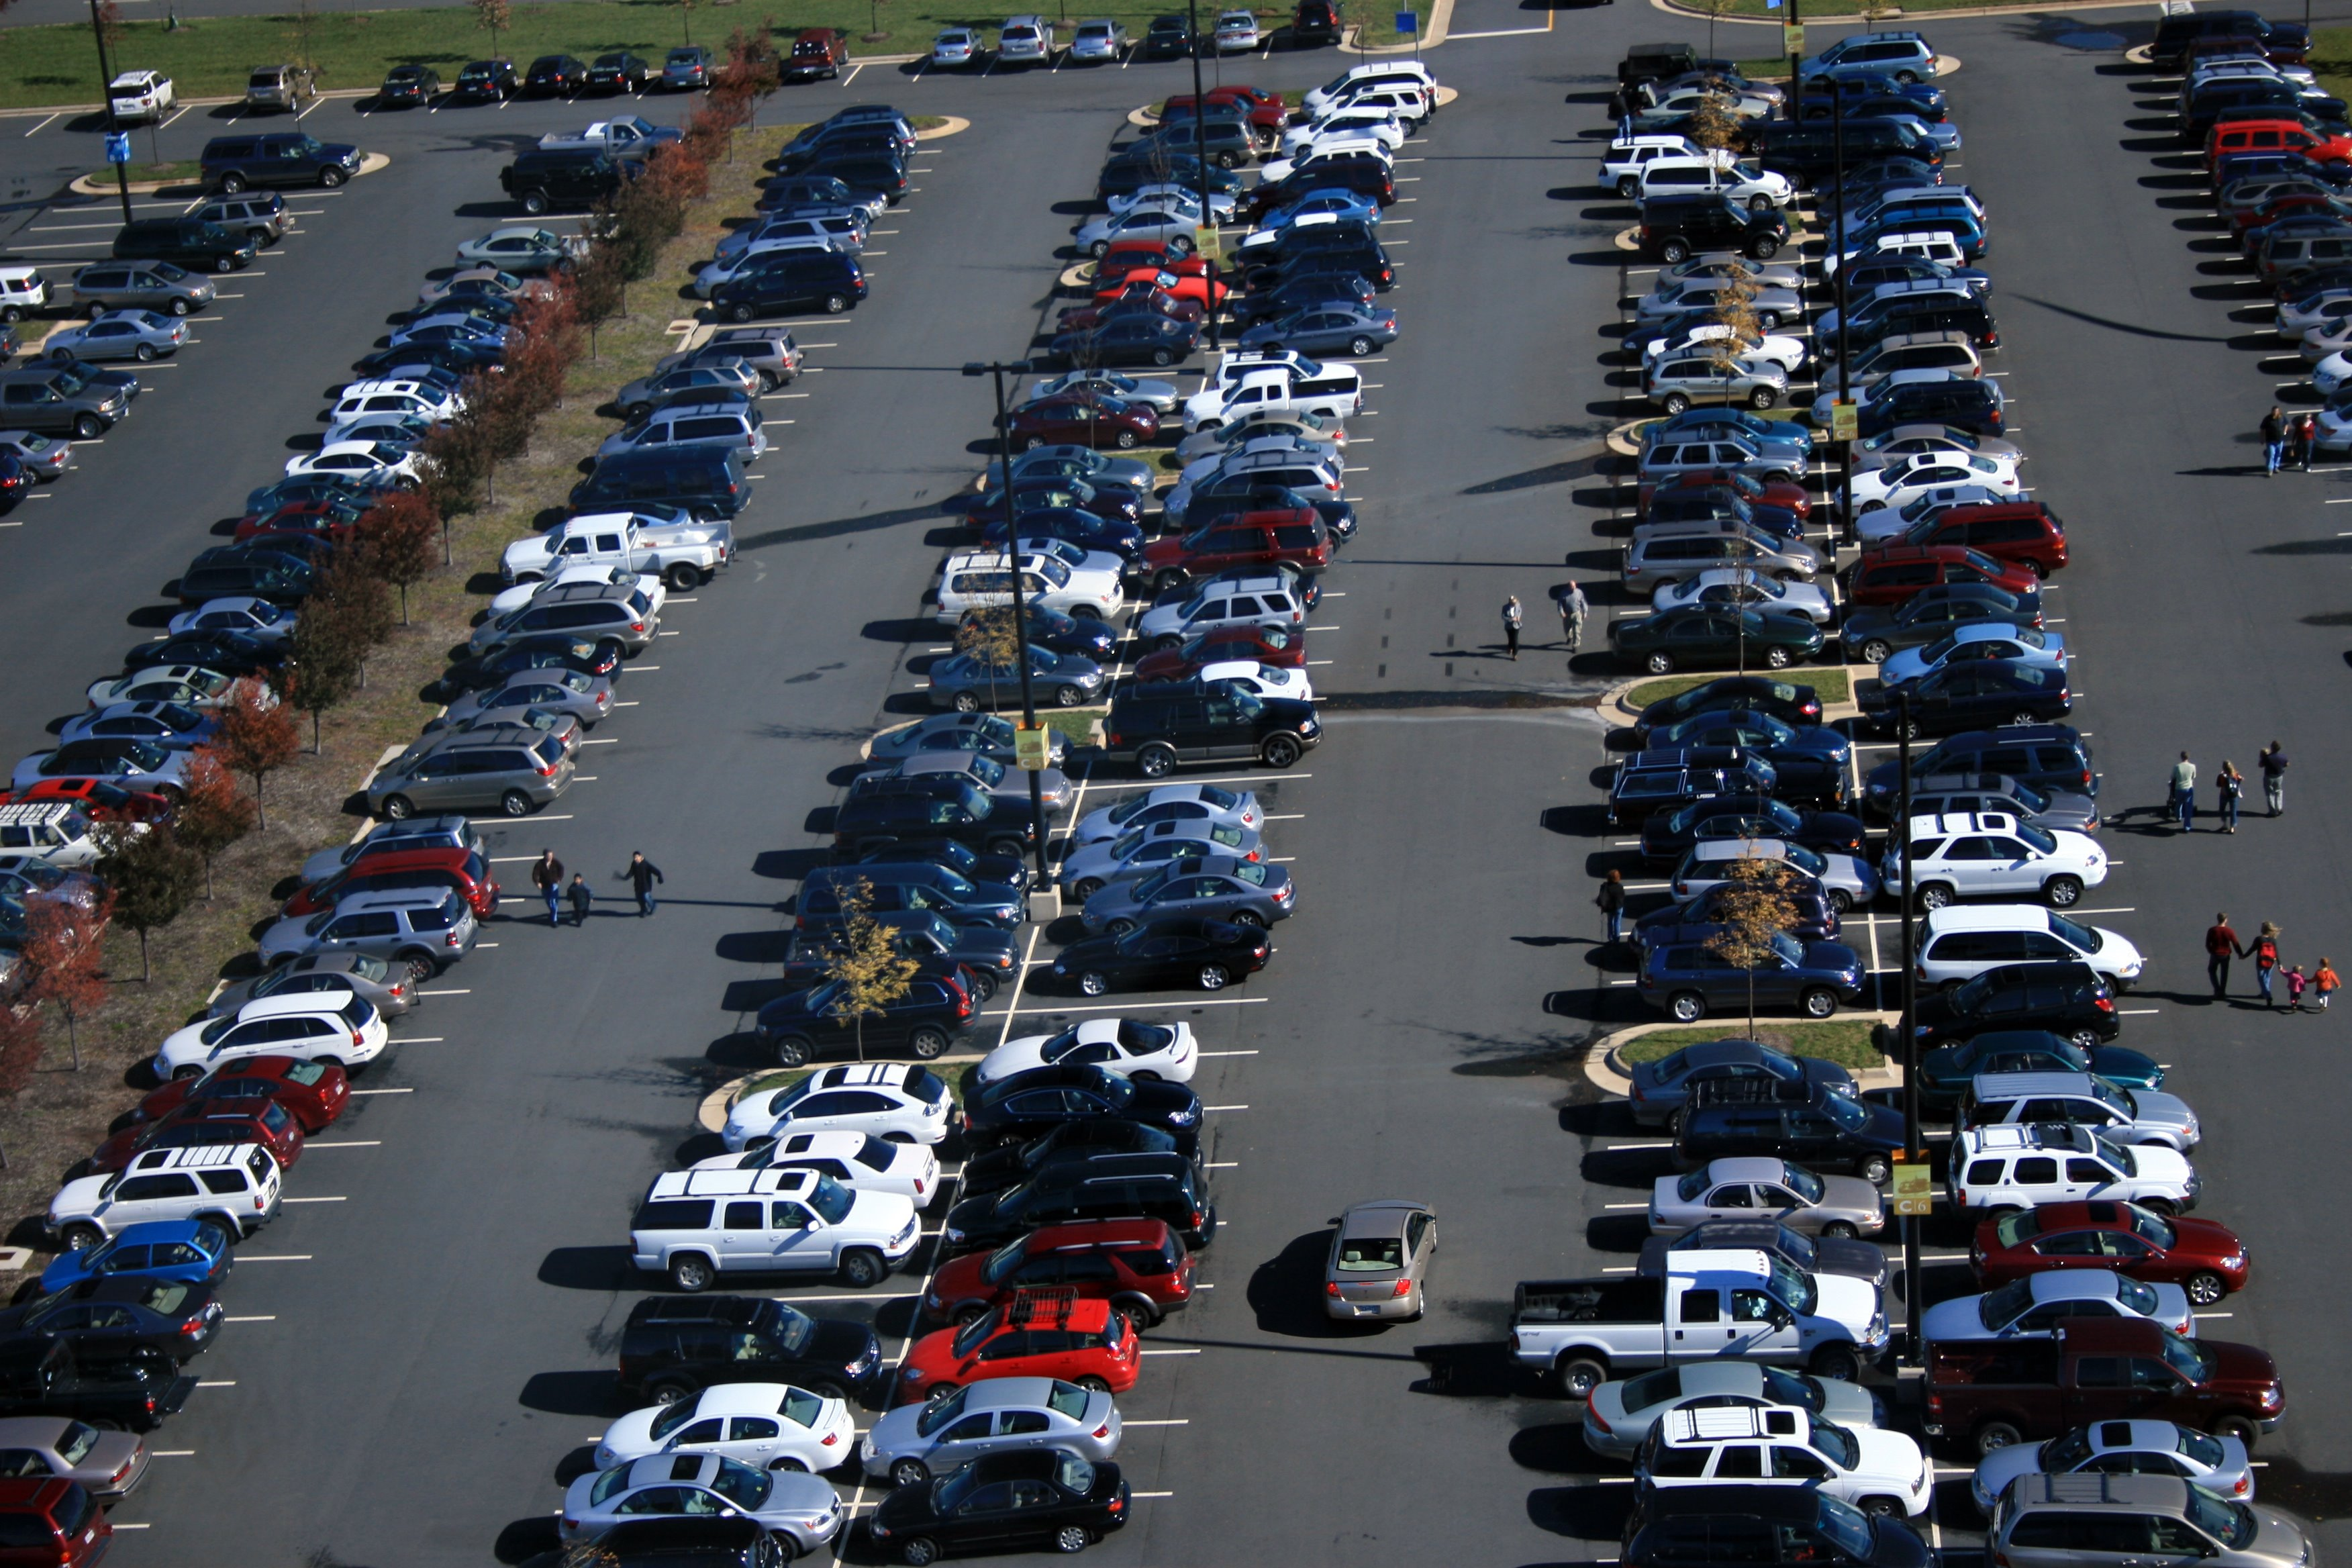 Parqueo congestionado